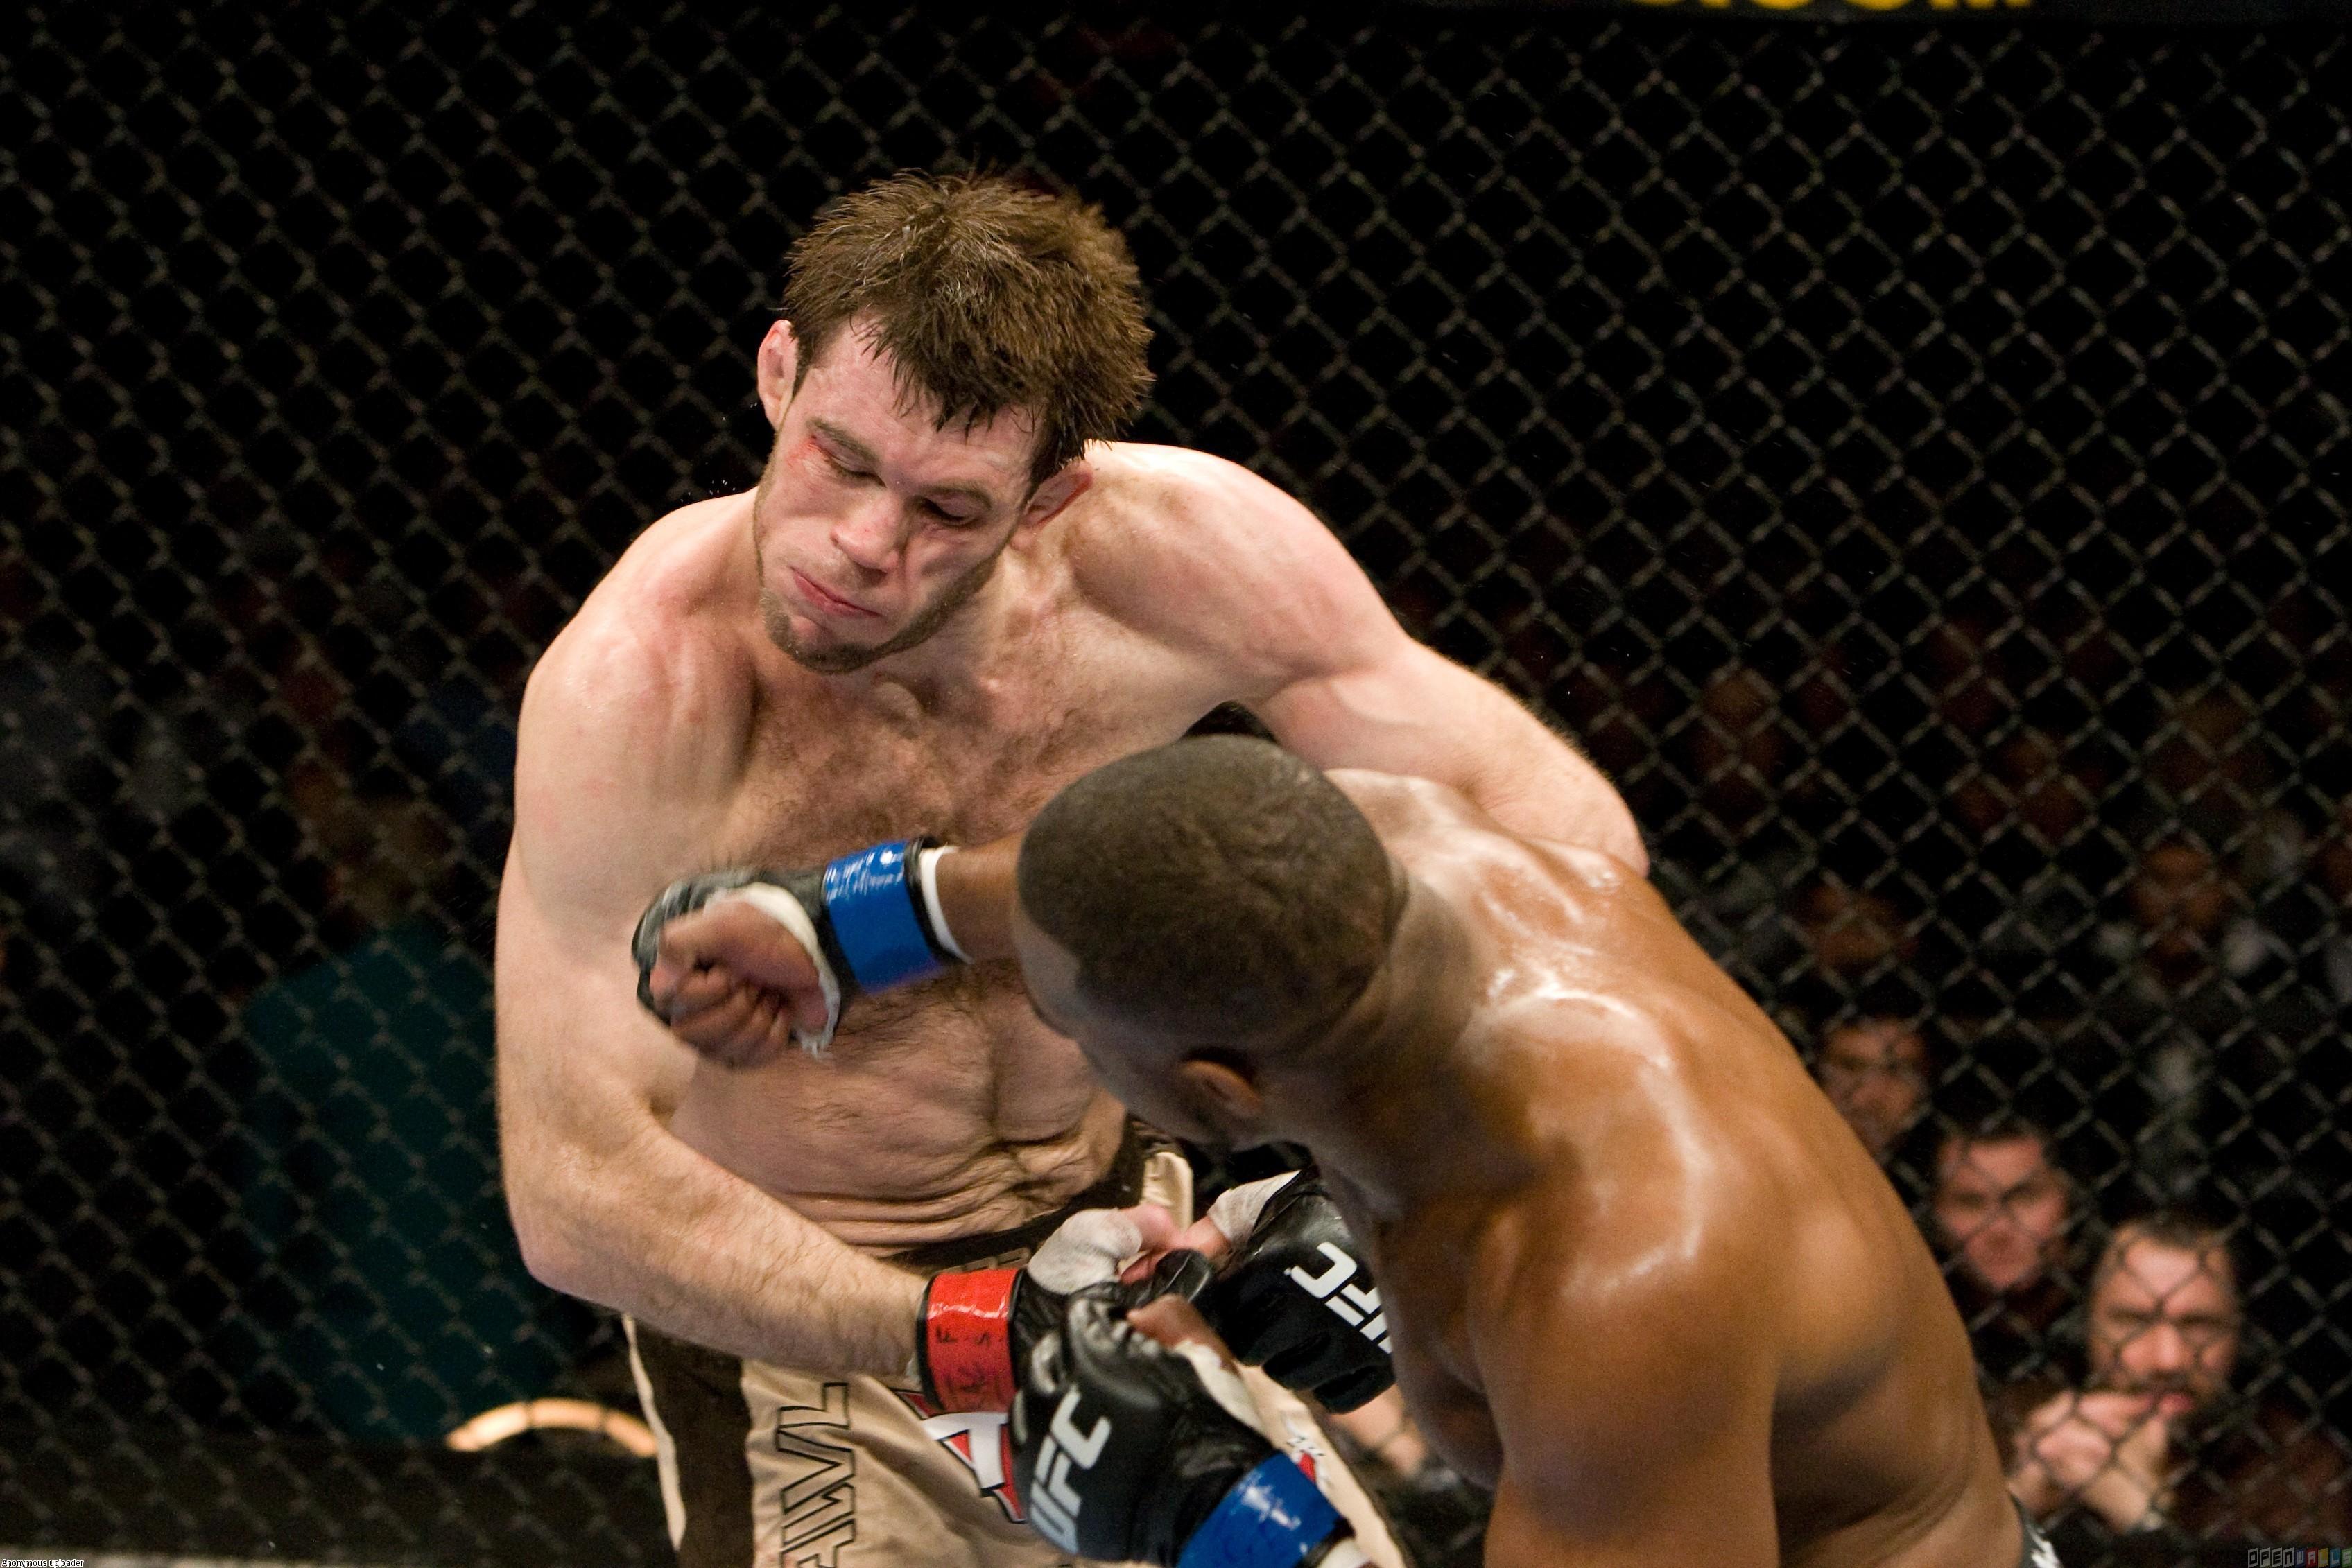 Rashad Evans punching Forrest Griffin